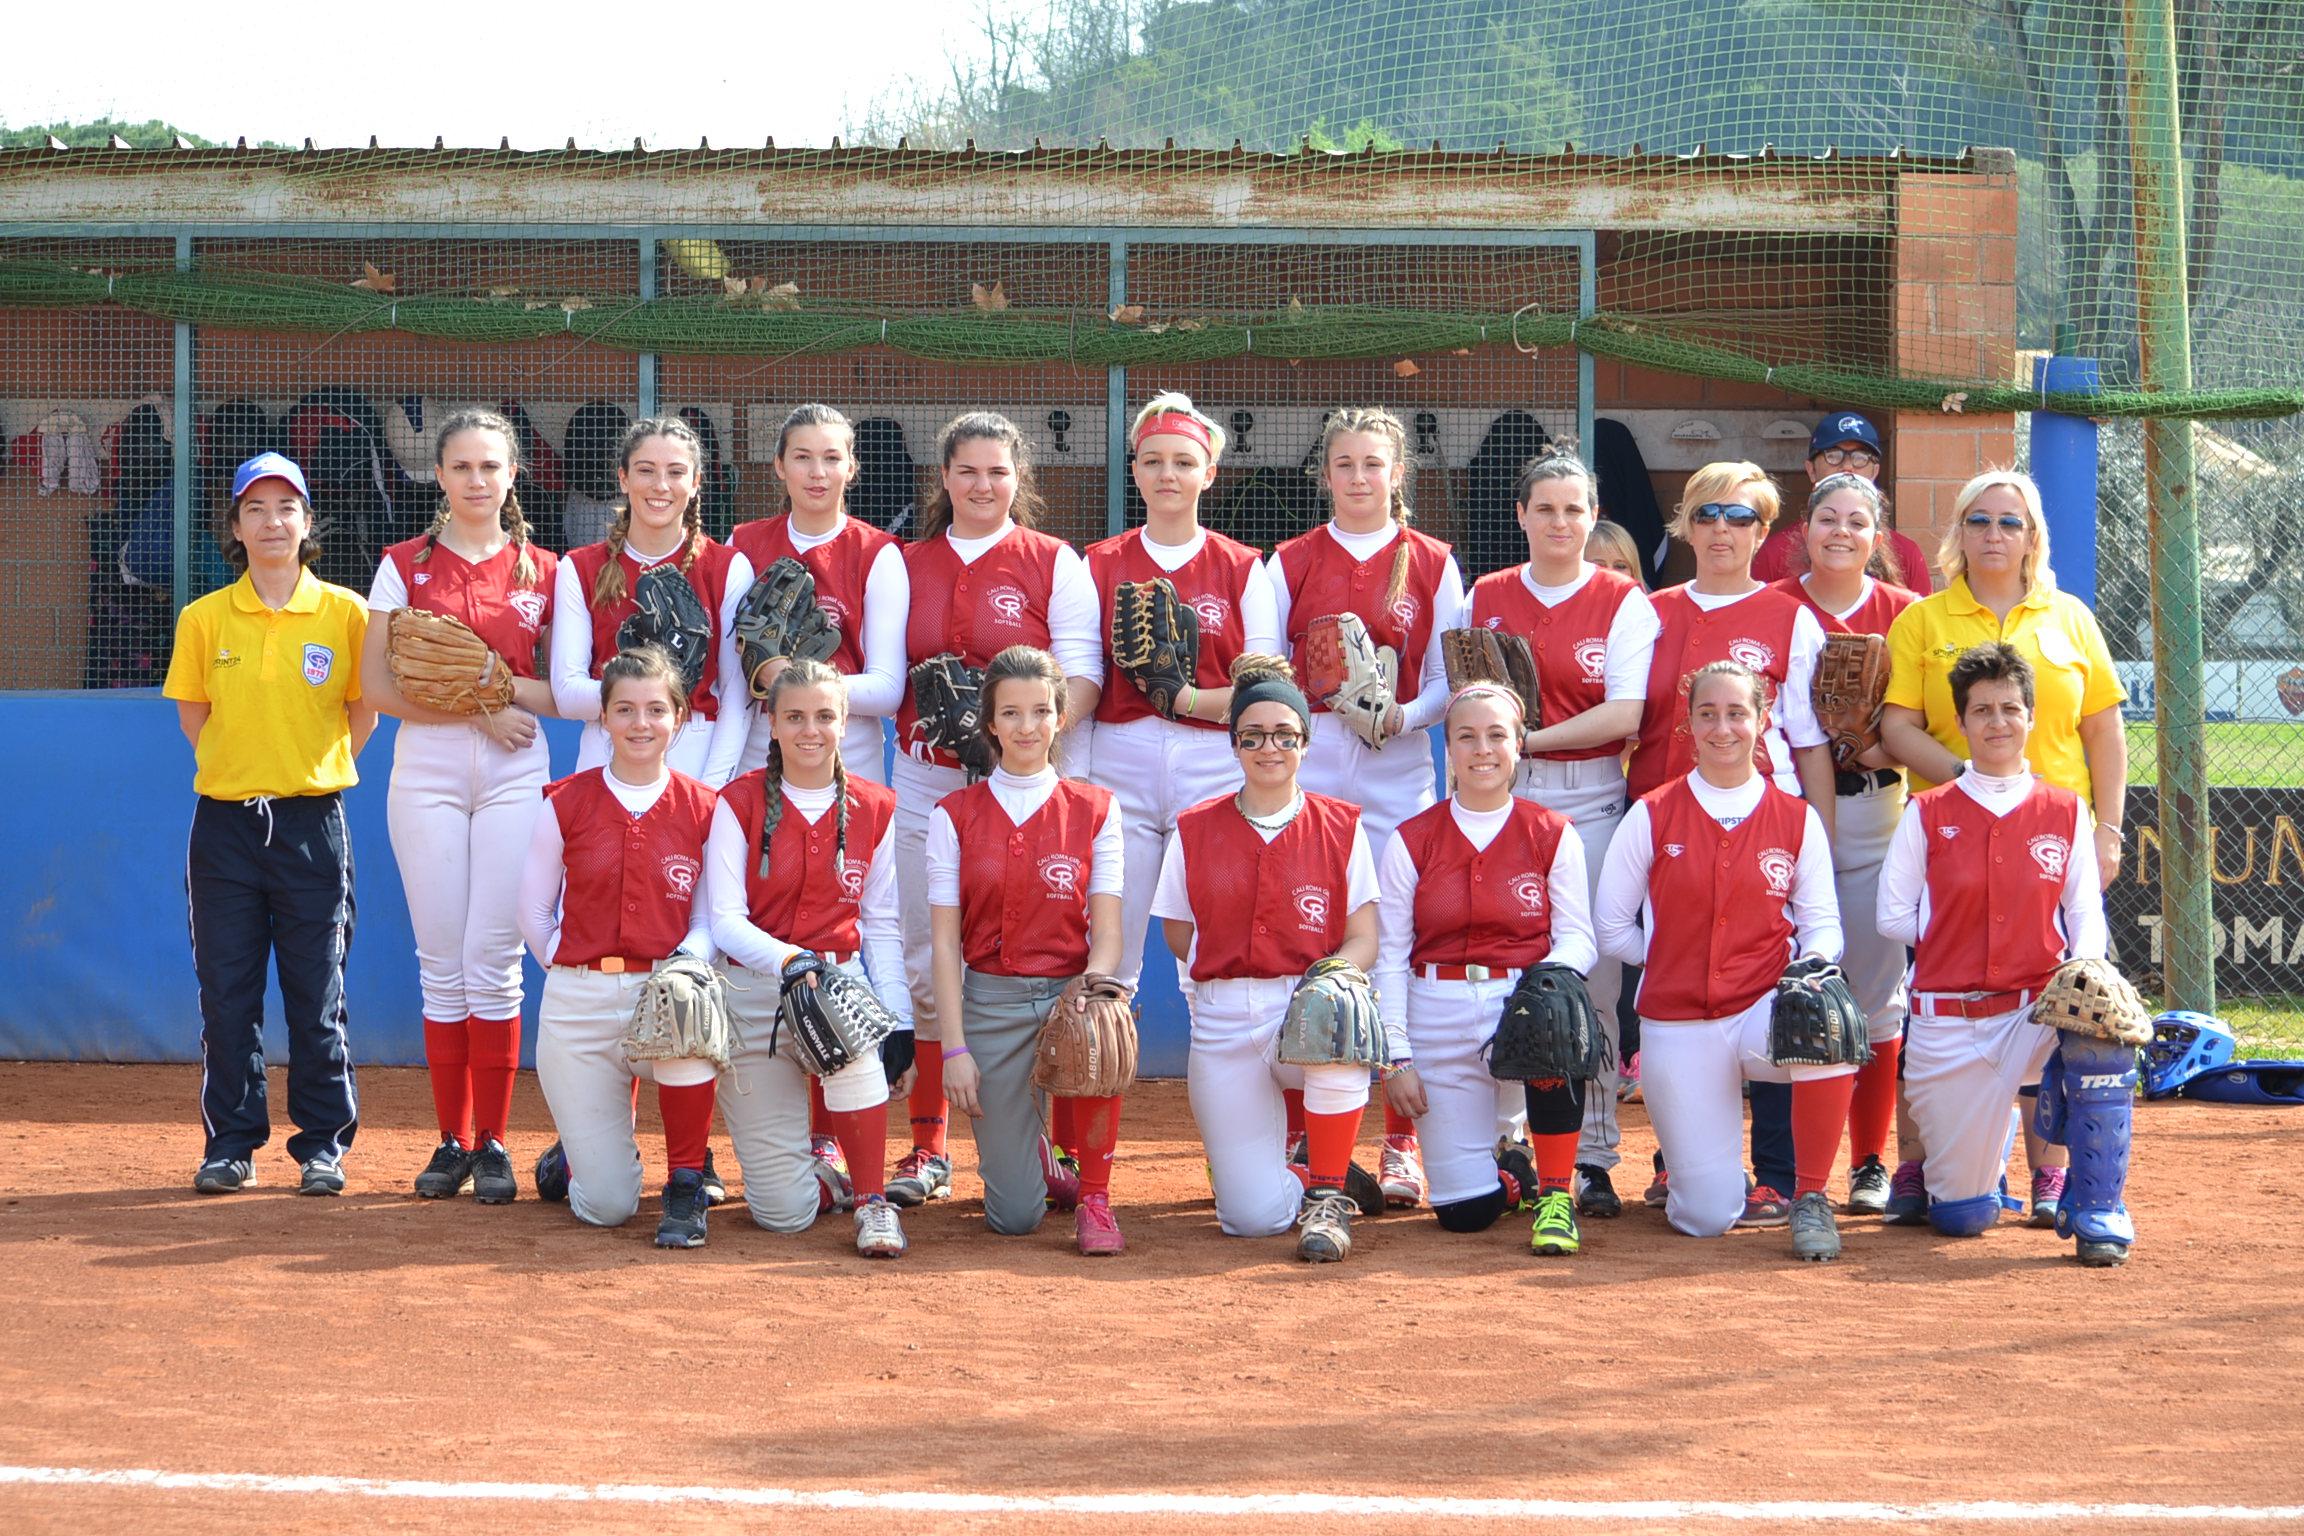 Rotostampa Cali Roma Girls DSC_0068